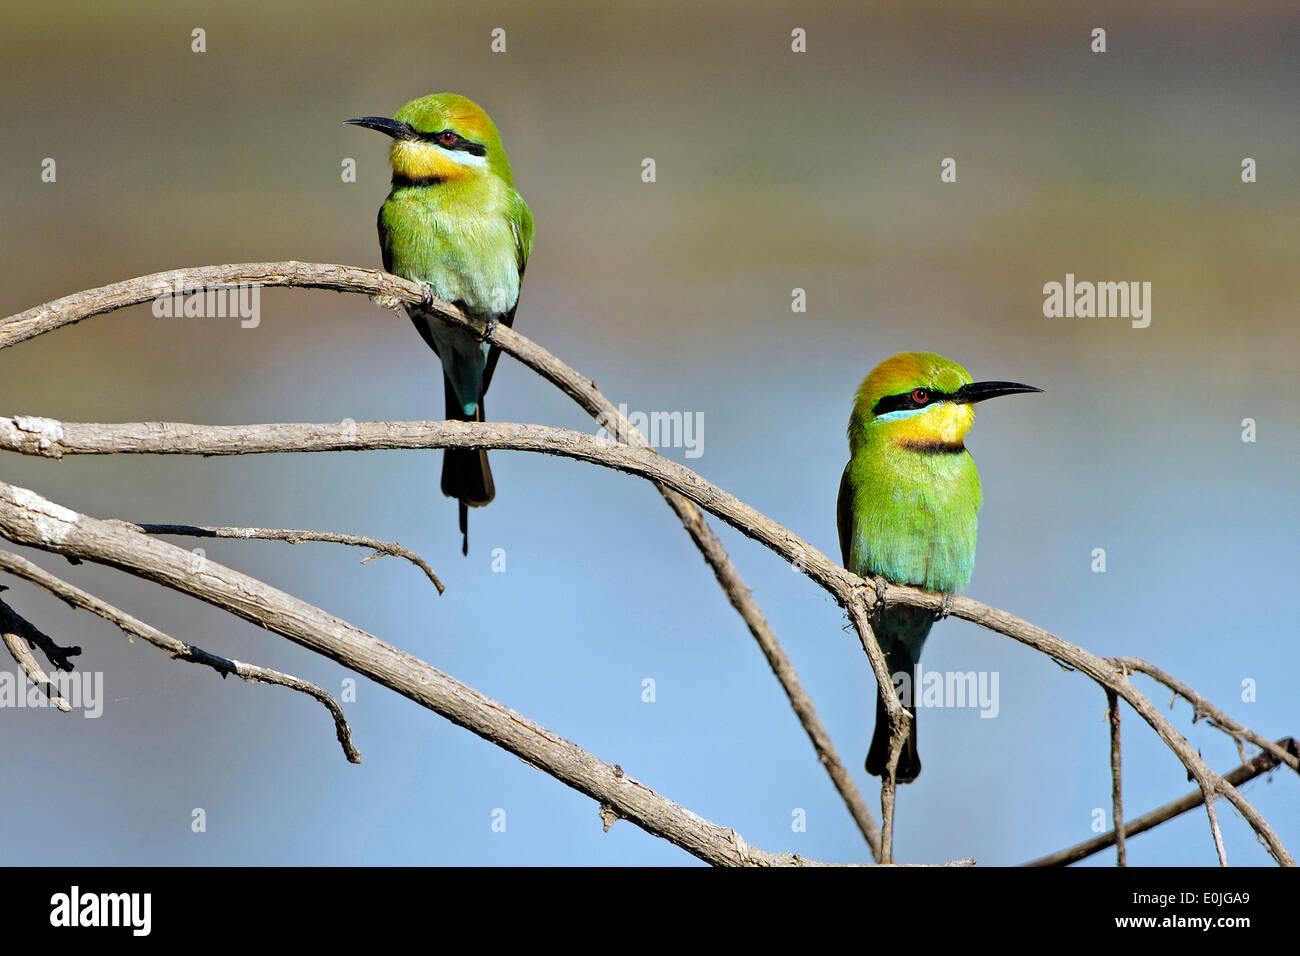 Regenbogenbienenfresser, Merops Ornatus, Kakadu NP, Northern Territory, Australien Stockbild